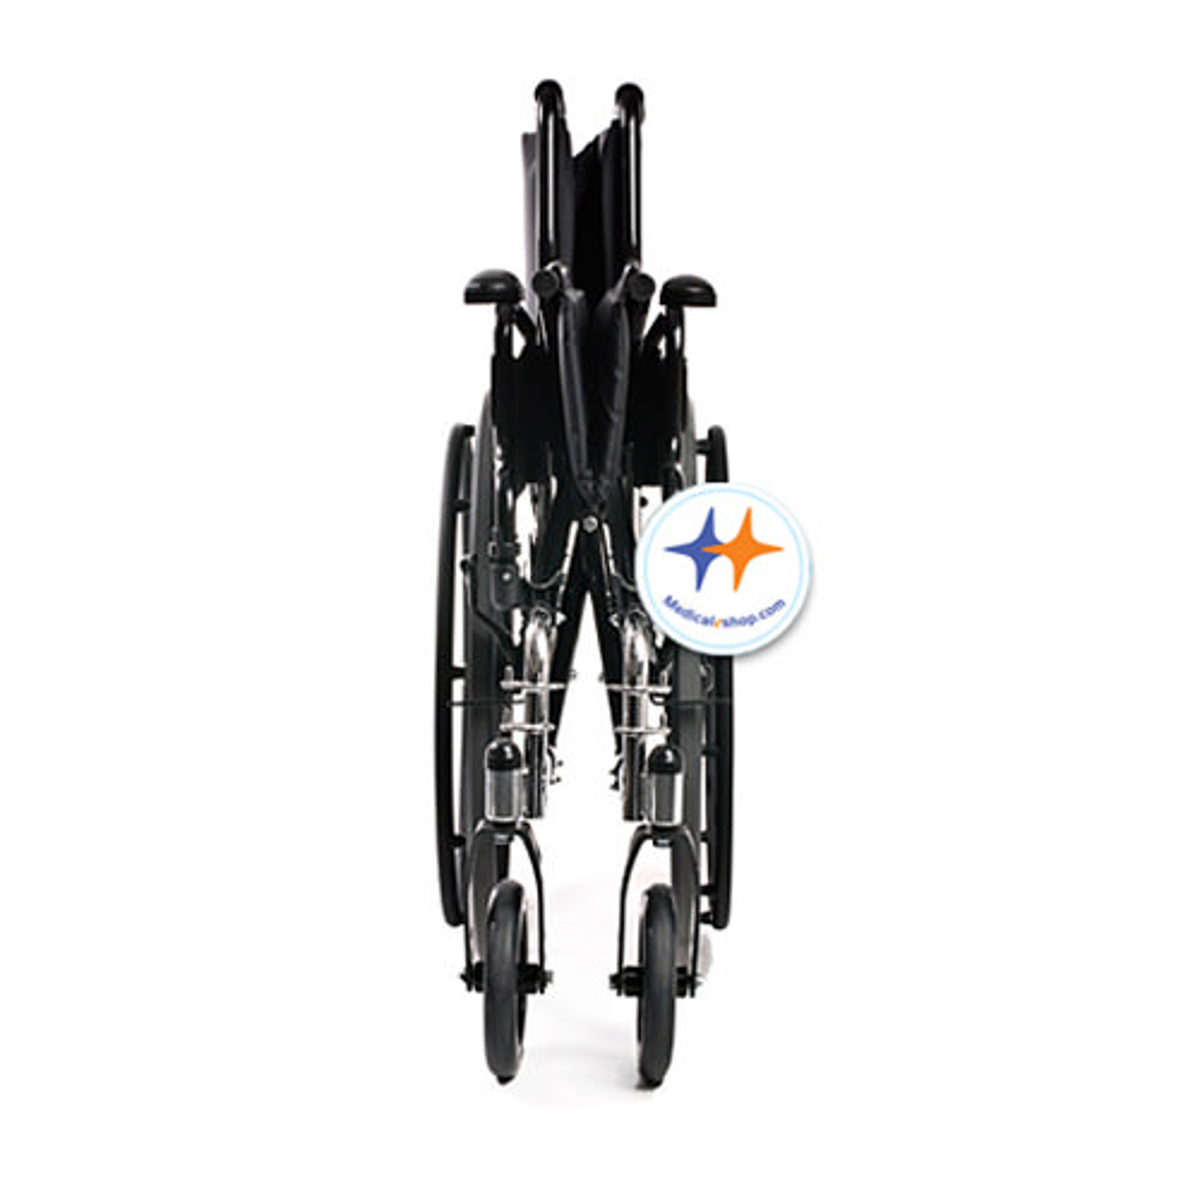 Invacare Ivc 9000 Sl Wheelchair   Invacare Wheelchair